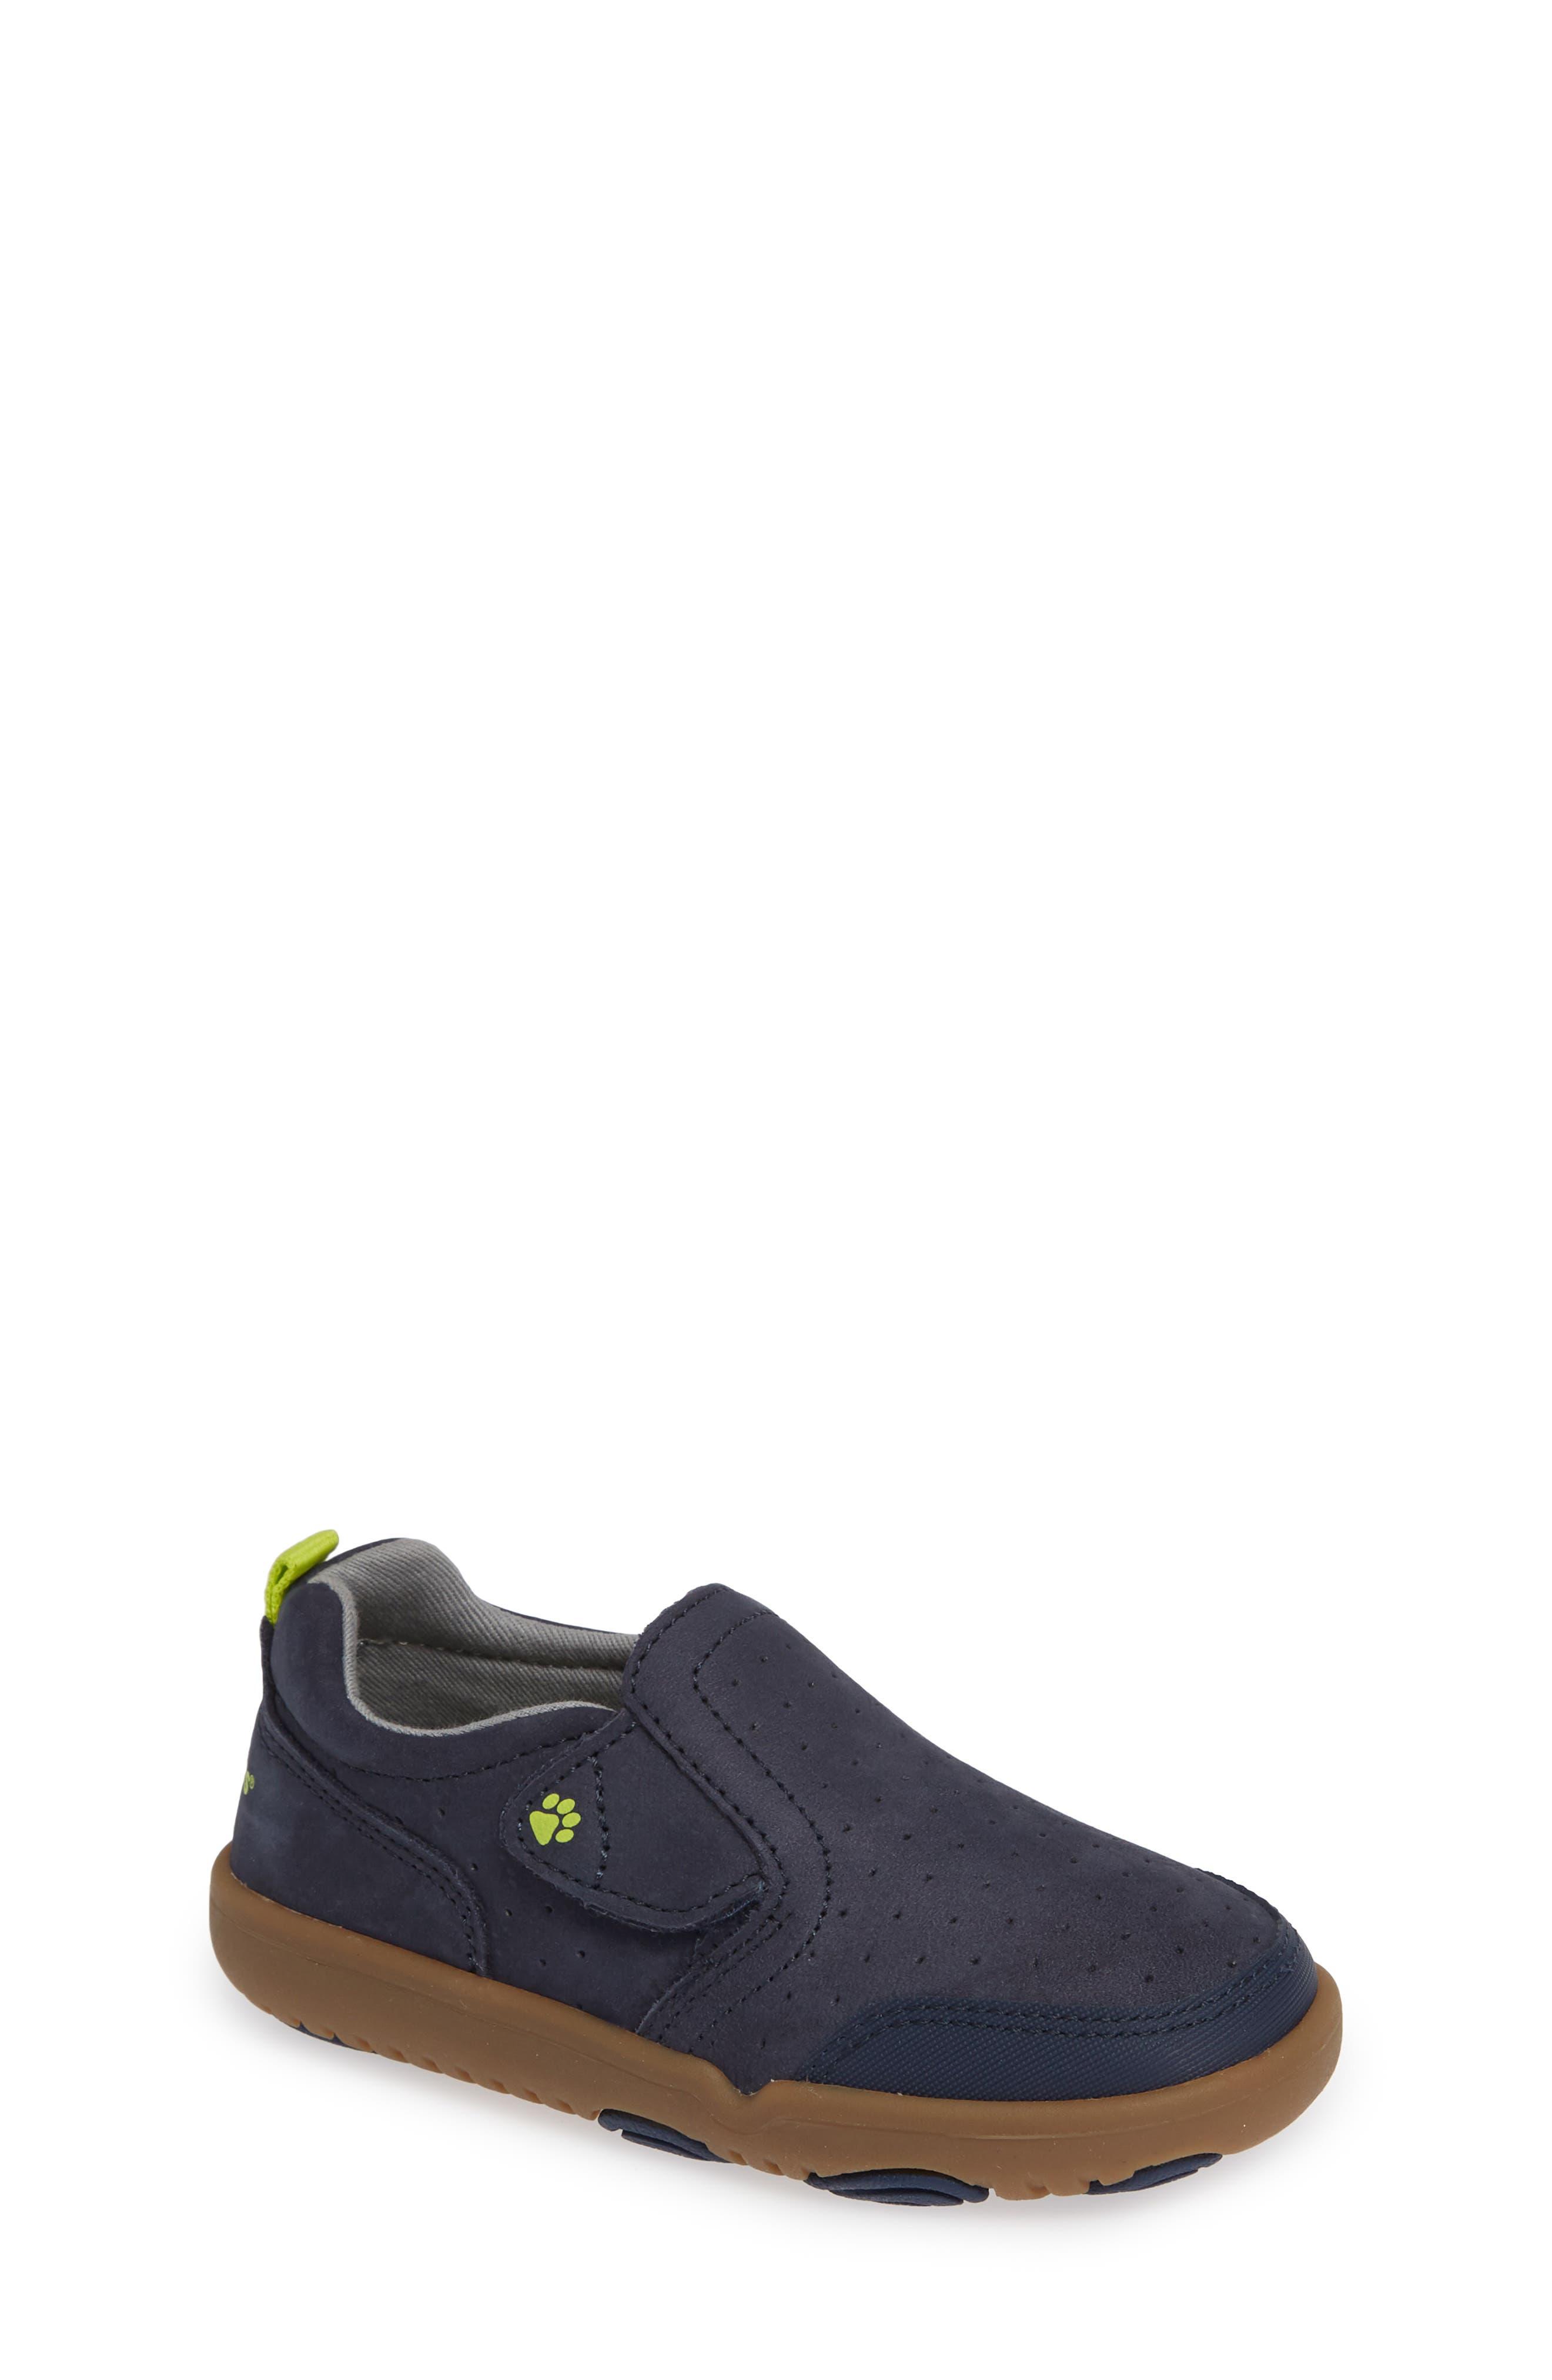 Marley Sneaker,                         Main,                         color, NAVY